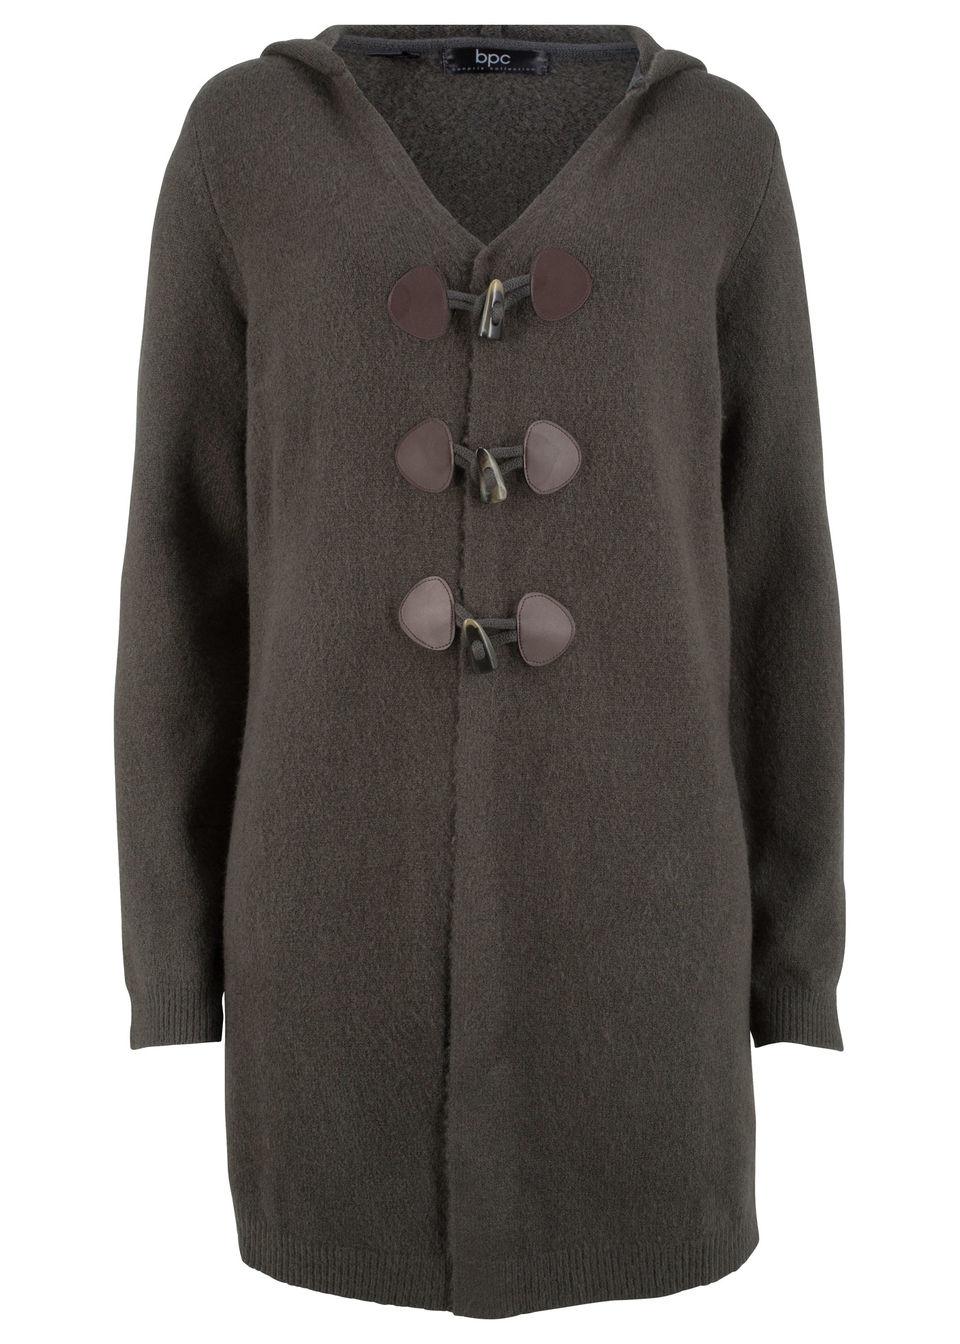 093d1268745d Dlhý pletený sveter s kapucňou